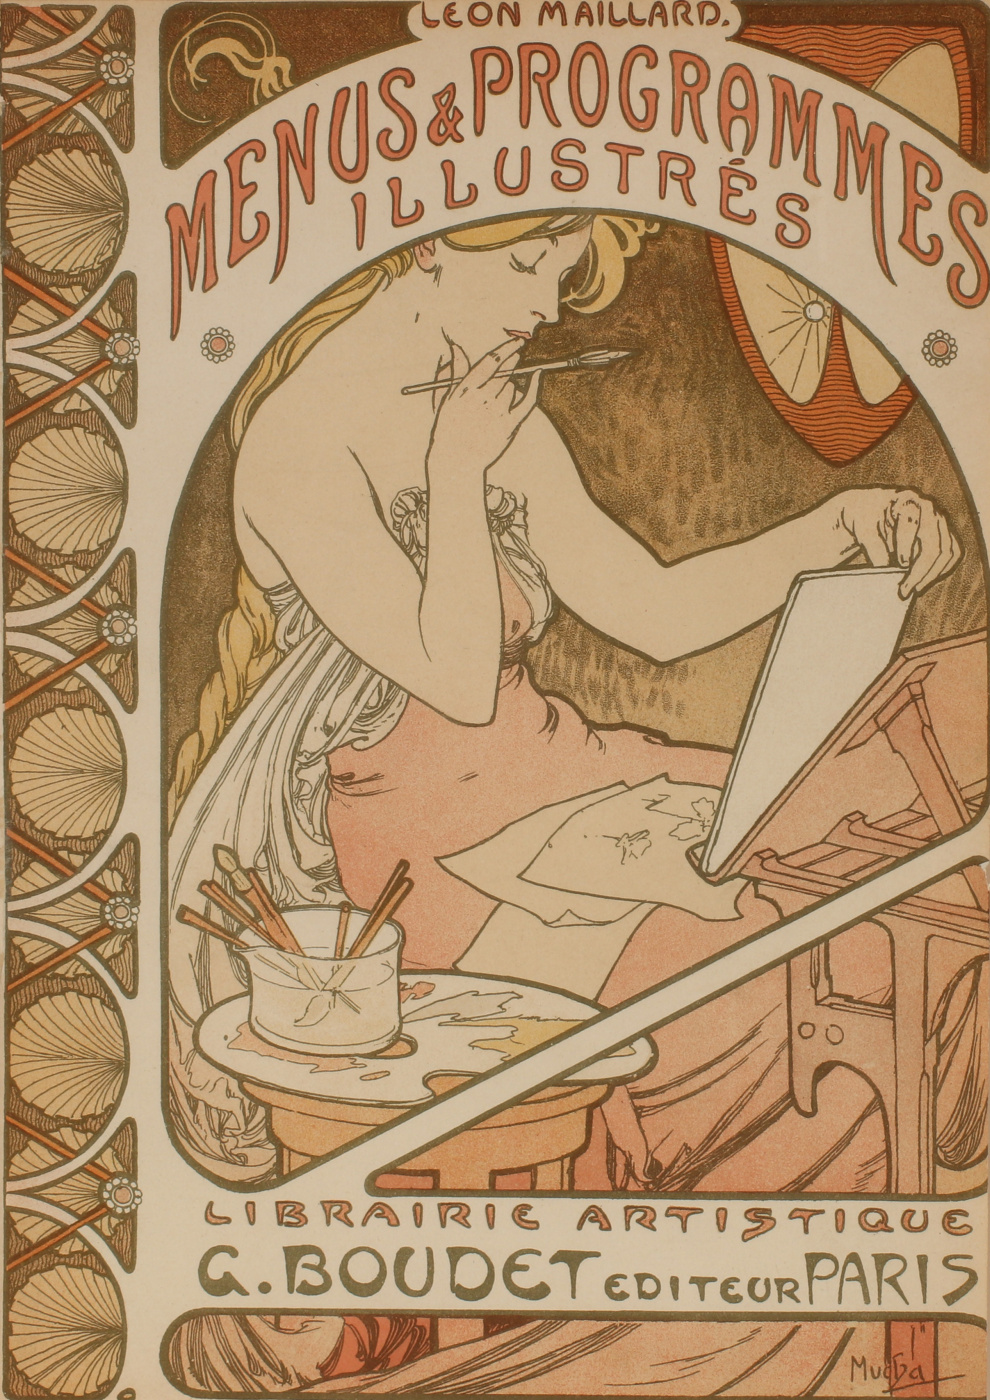 Alphonse Mucha. Menu and program illustration